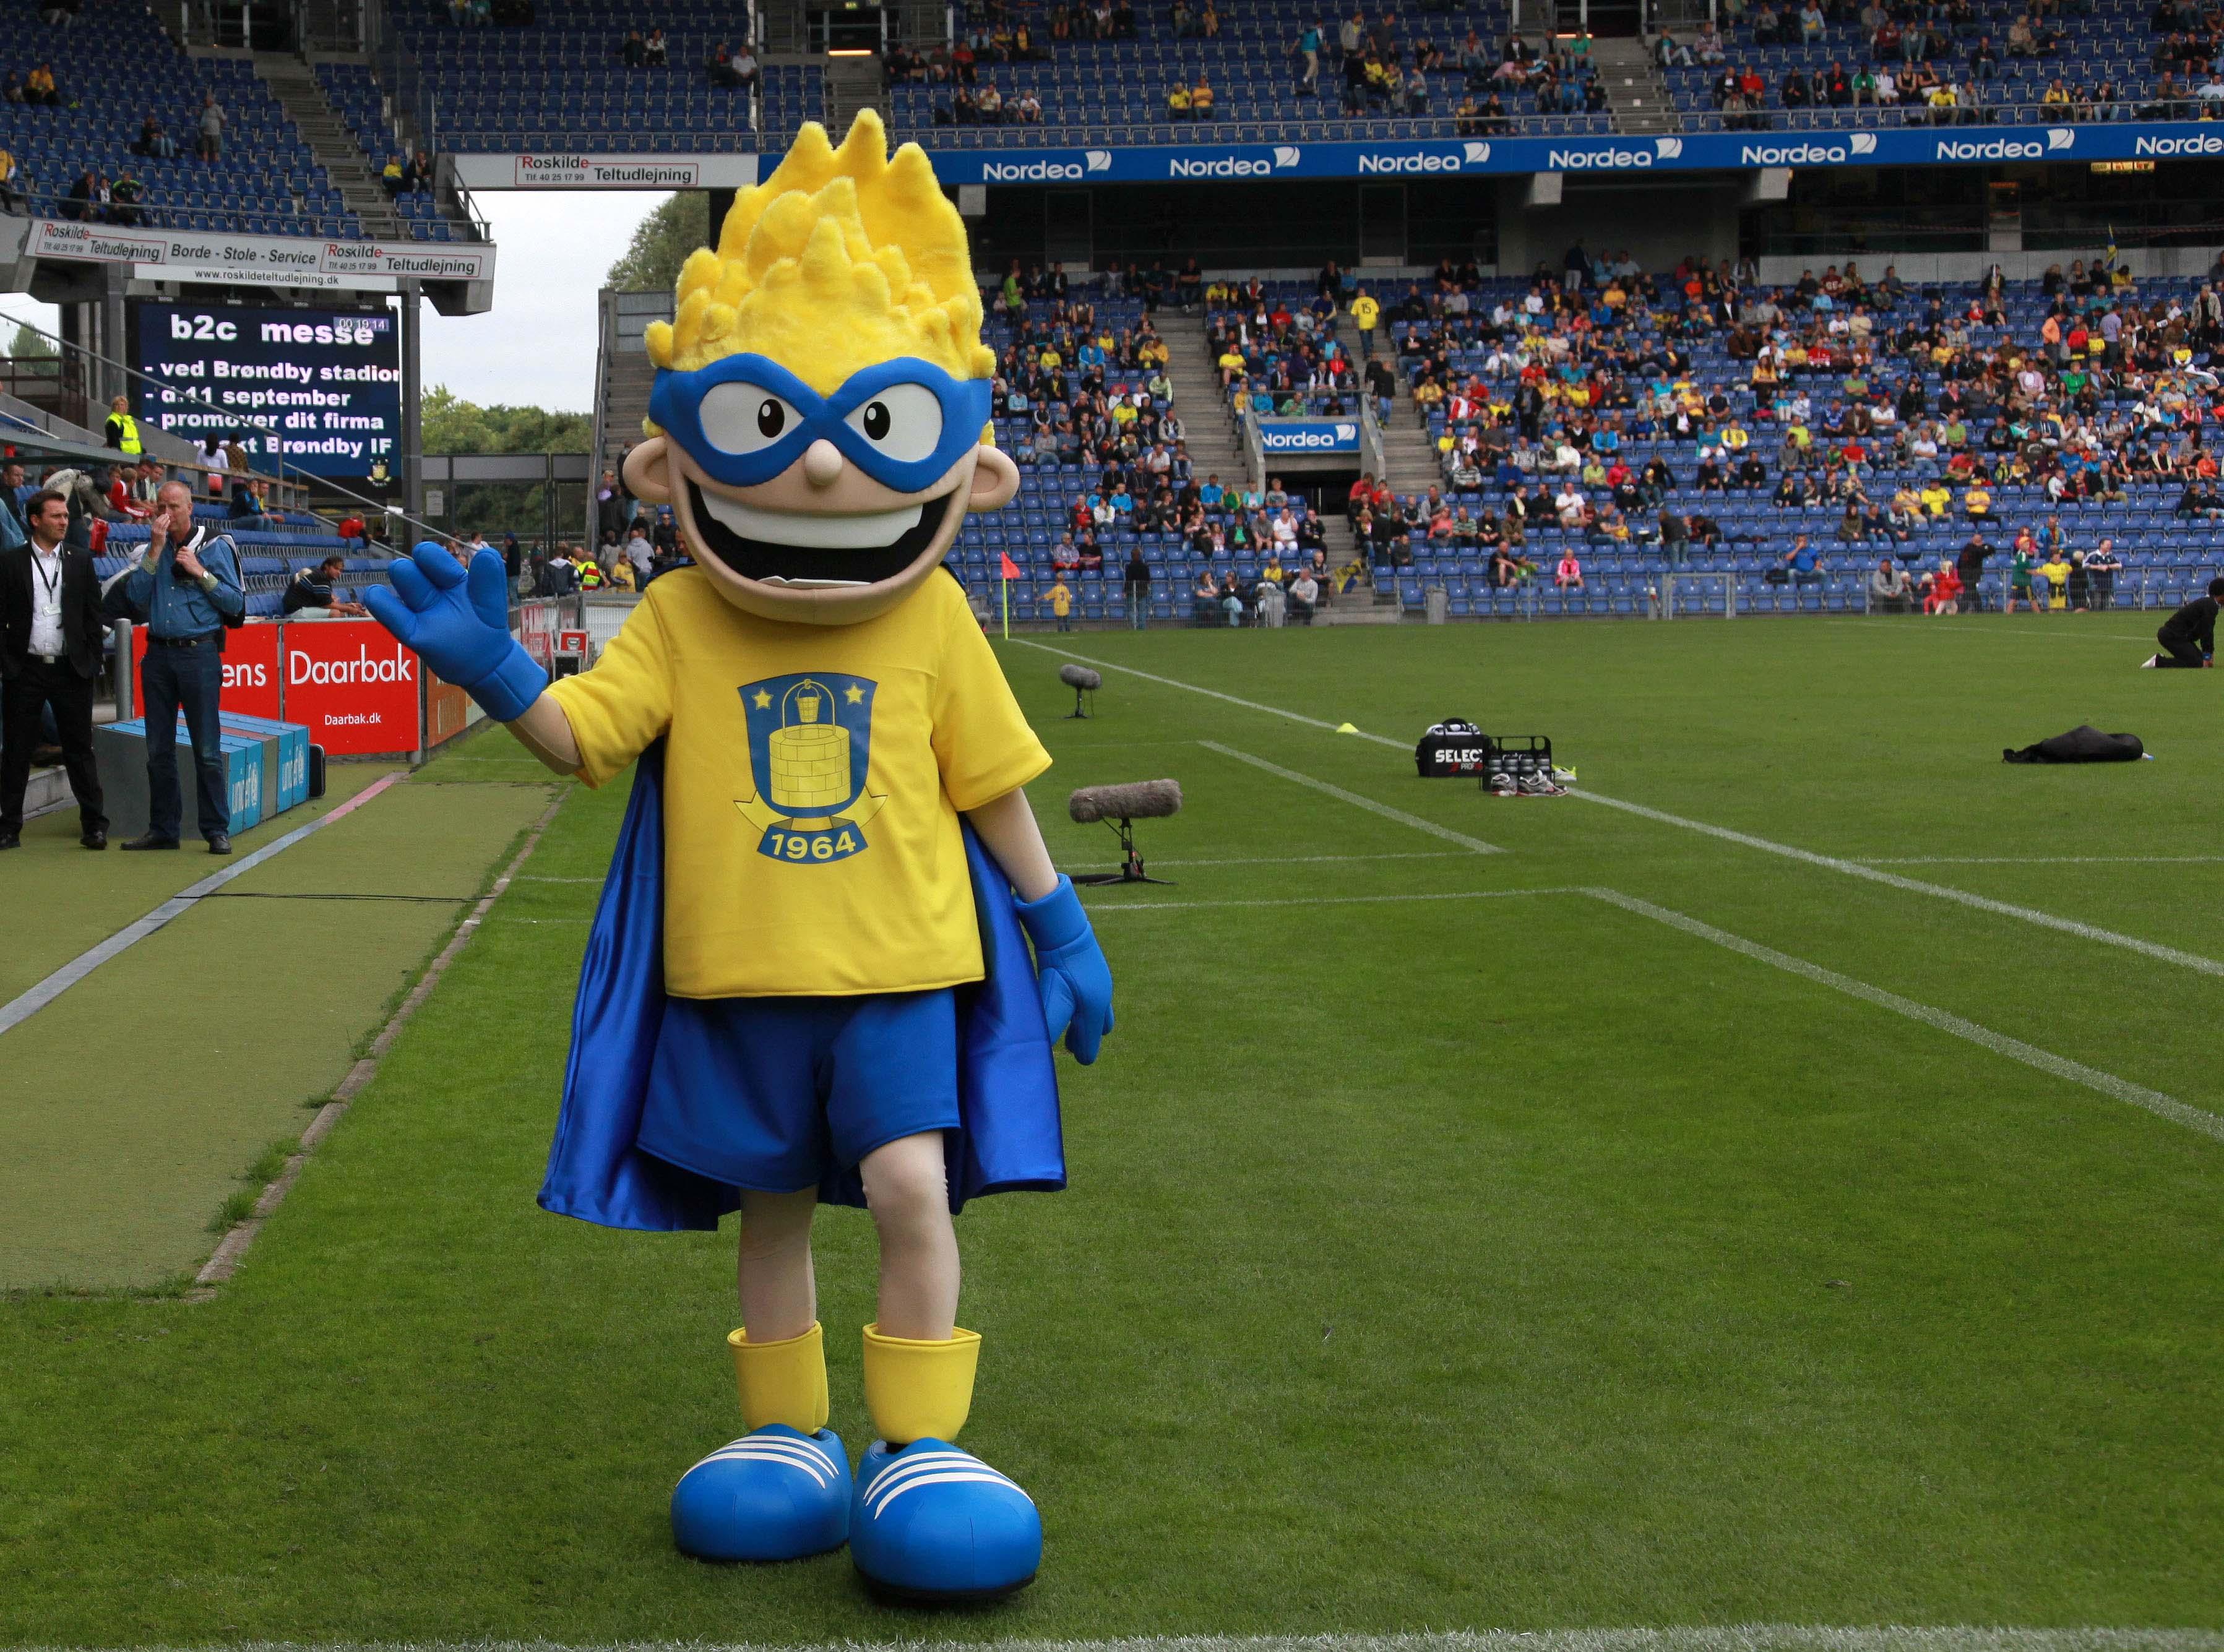 Brondbyernes IF Fodbold AS sports mascot